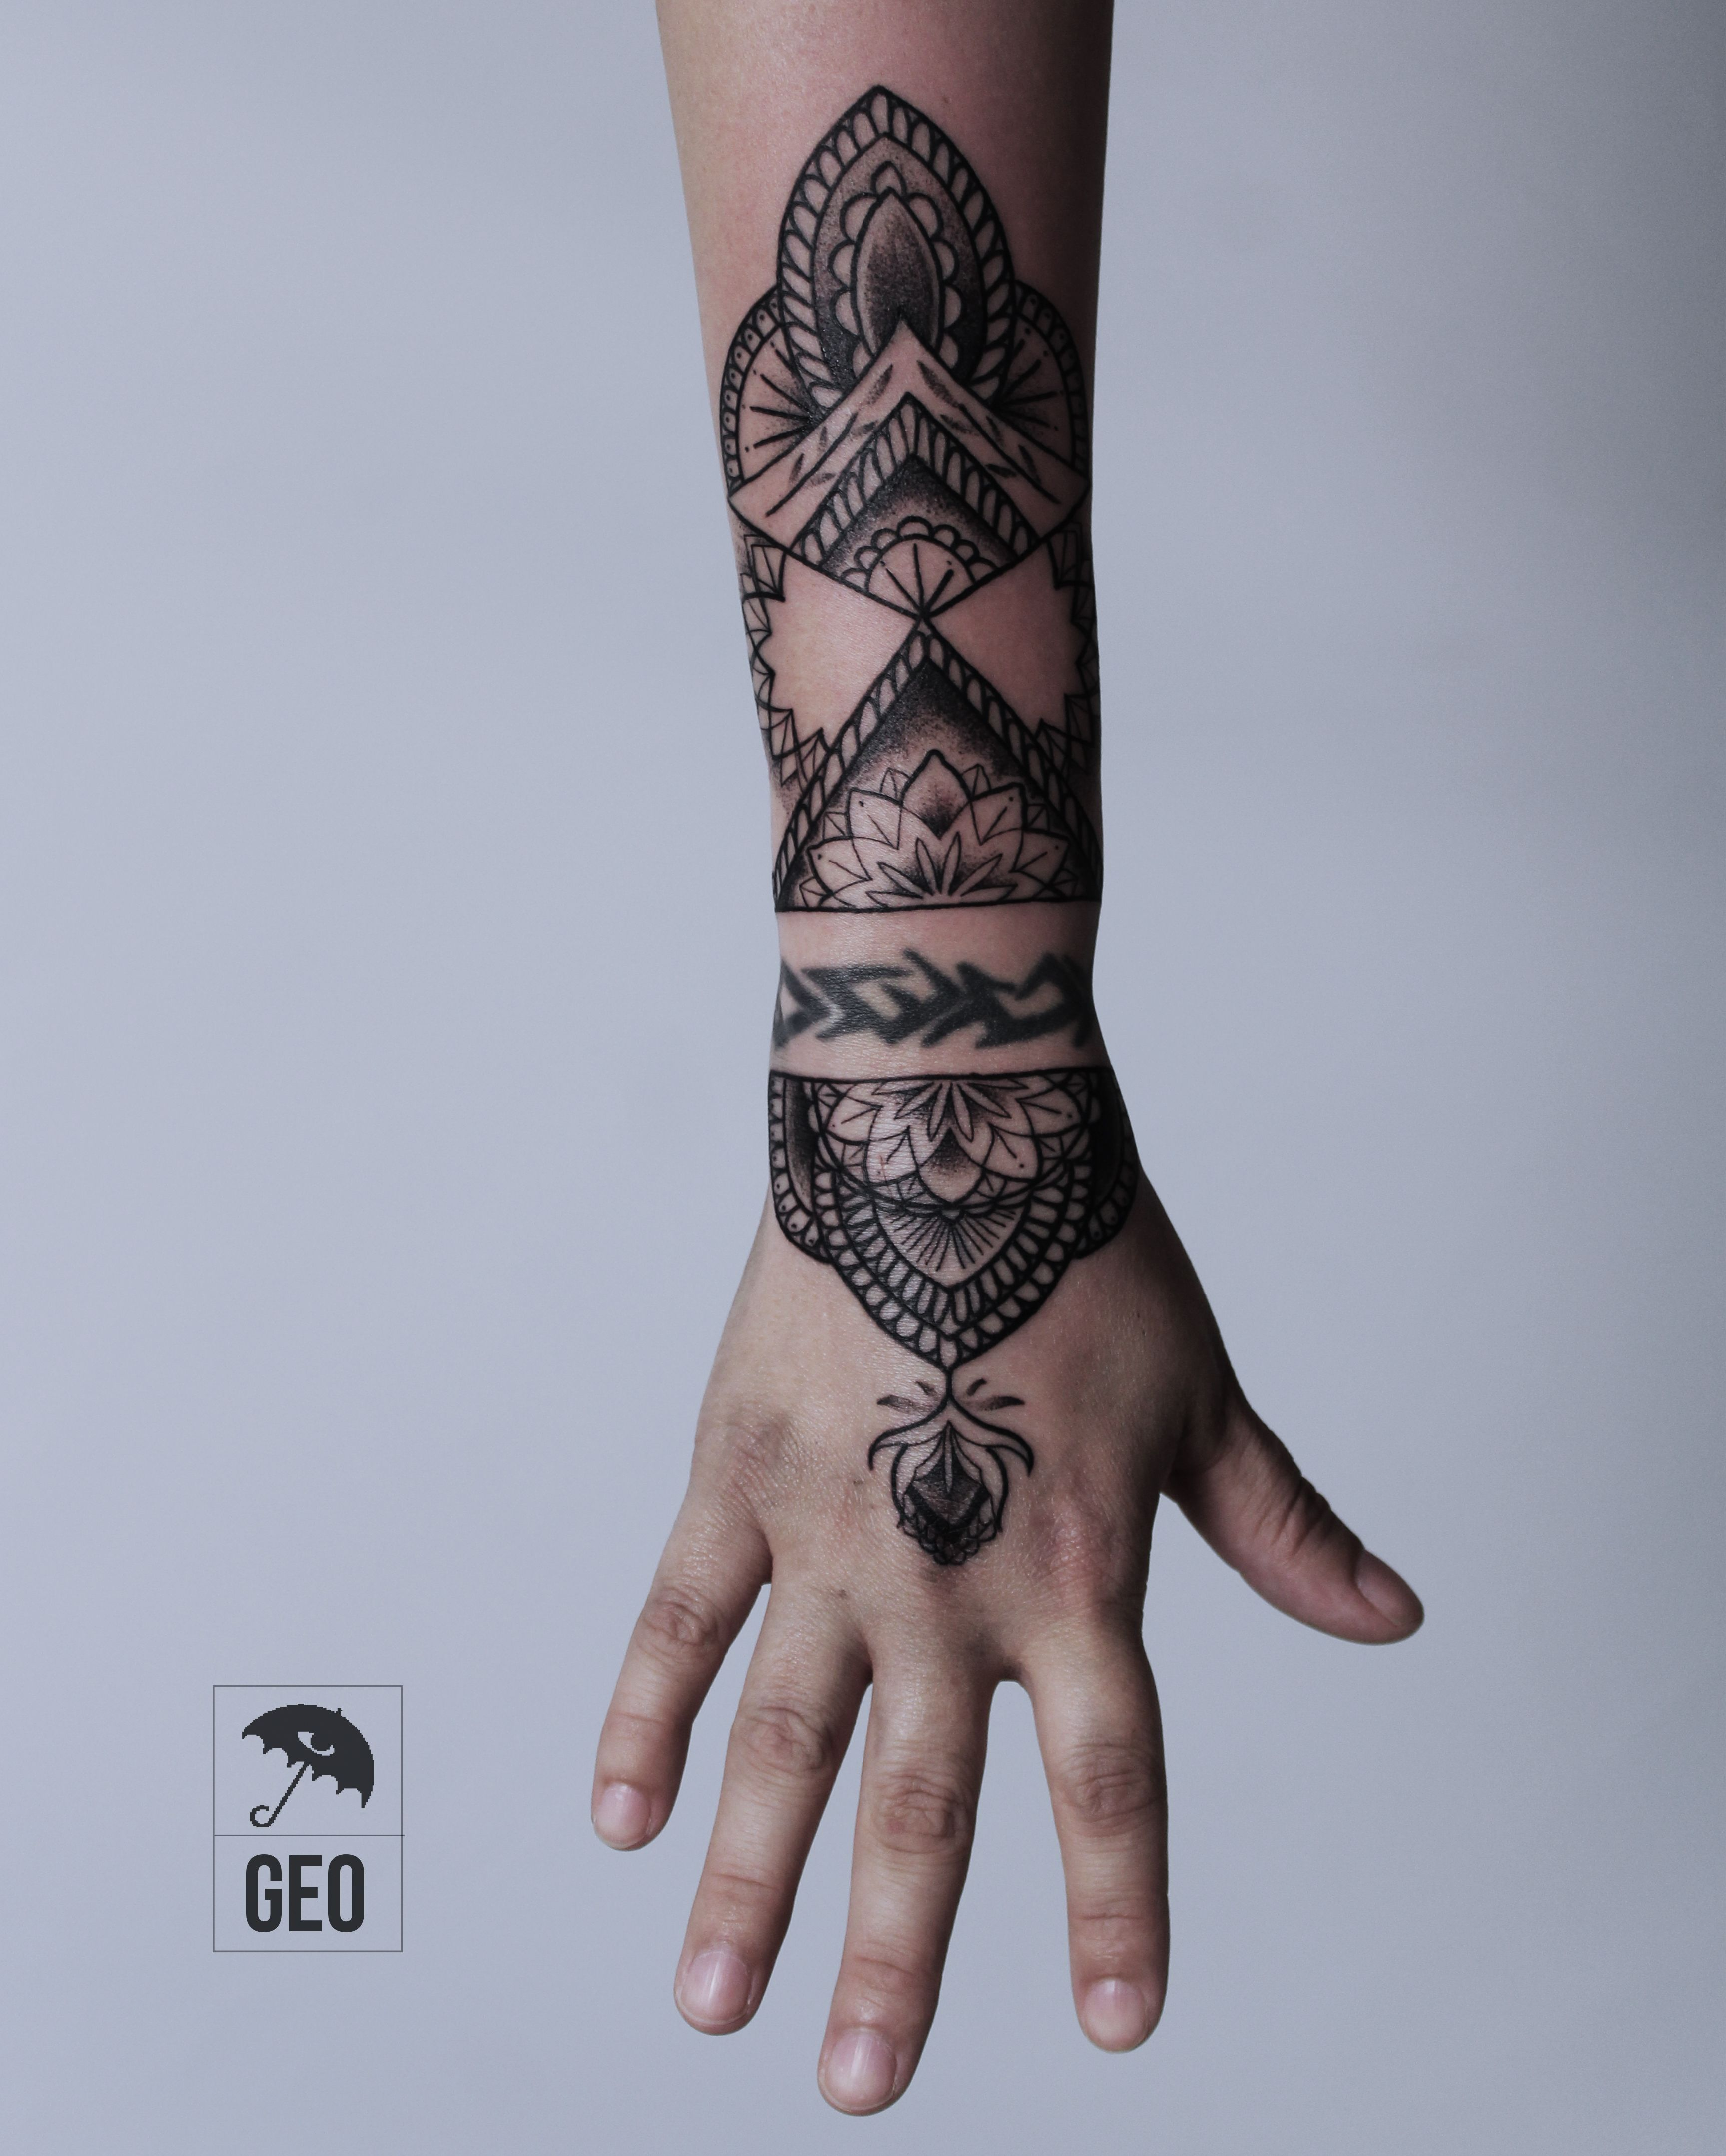 Ornamental Bracelet Tattoo On The Left Wrist Tattoo: Ornamental, Ornamental Tattoo, Ornamental Tattoos, Wrist